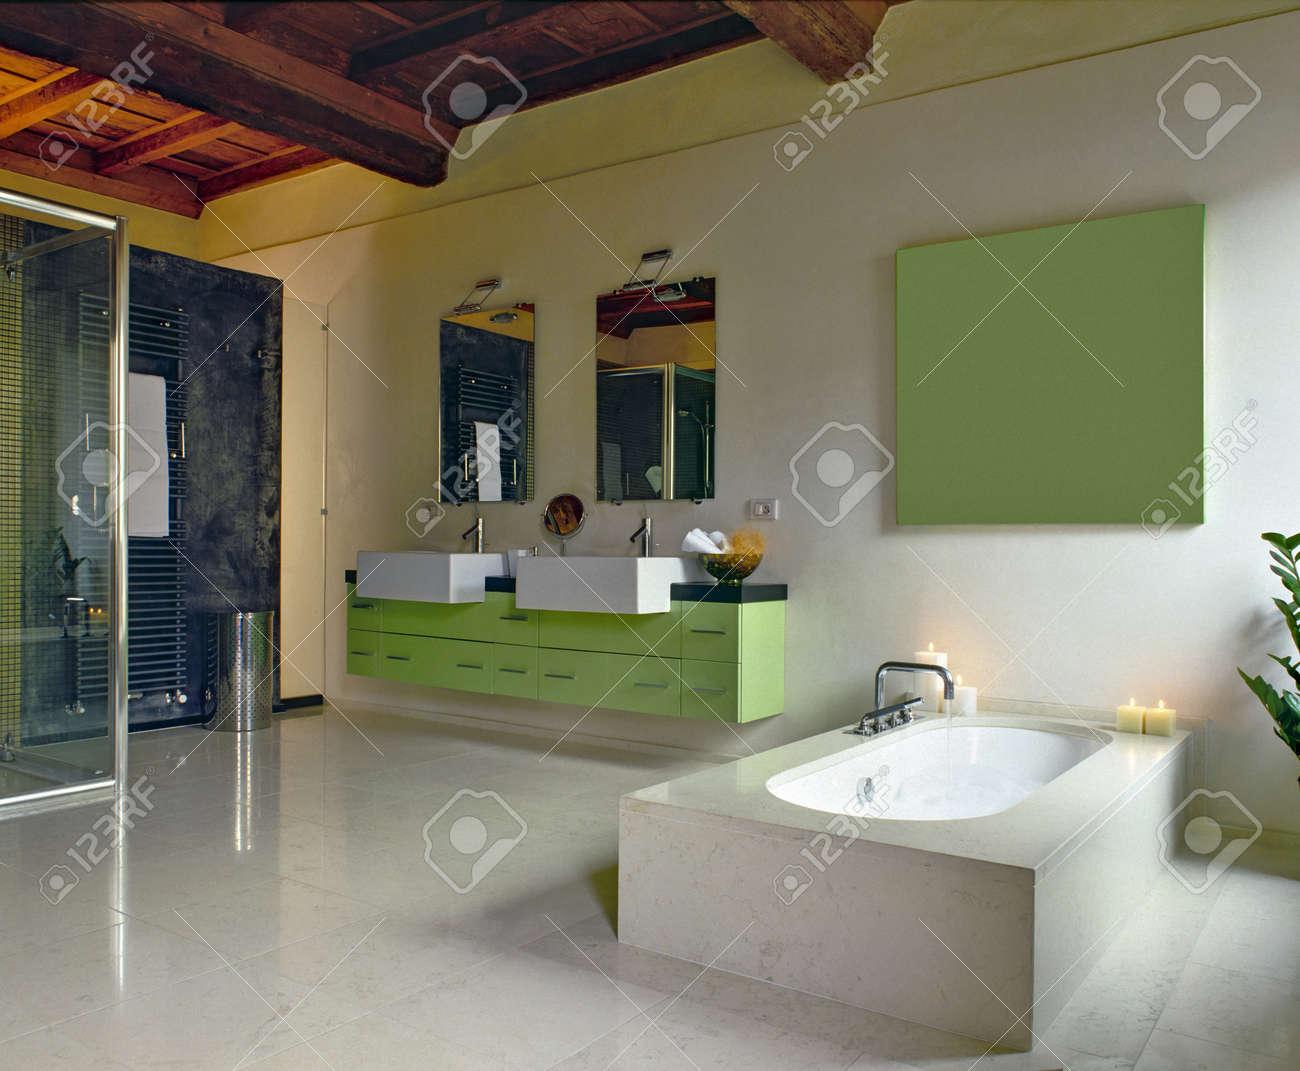 green furniture in a modern bathroom and bathtub Stock Photo - 13615167